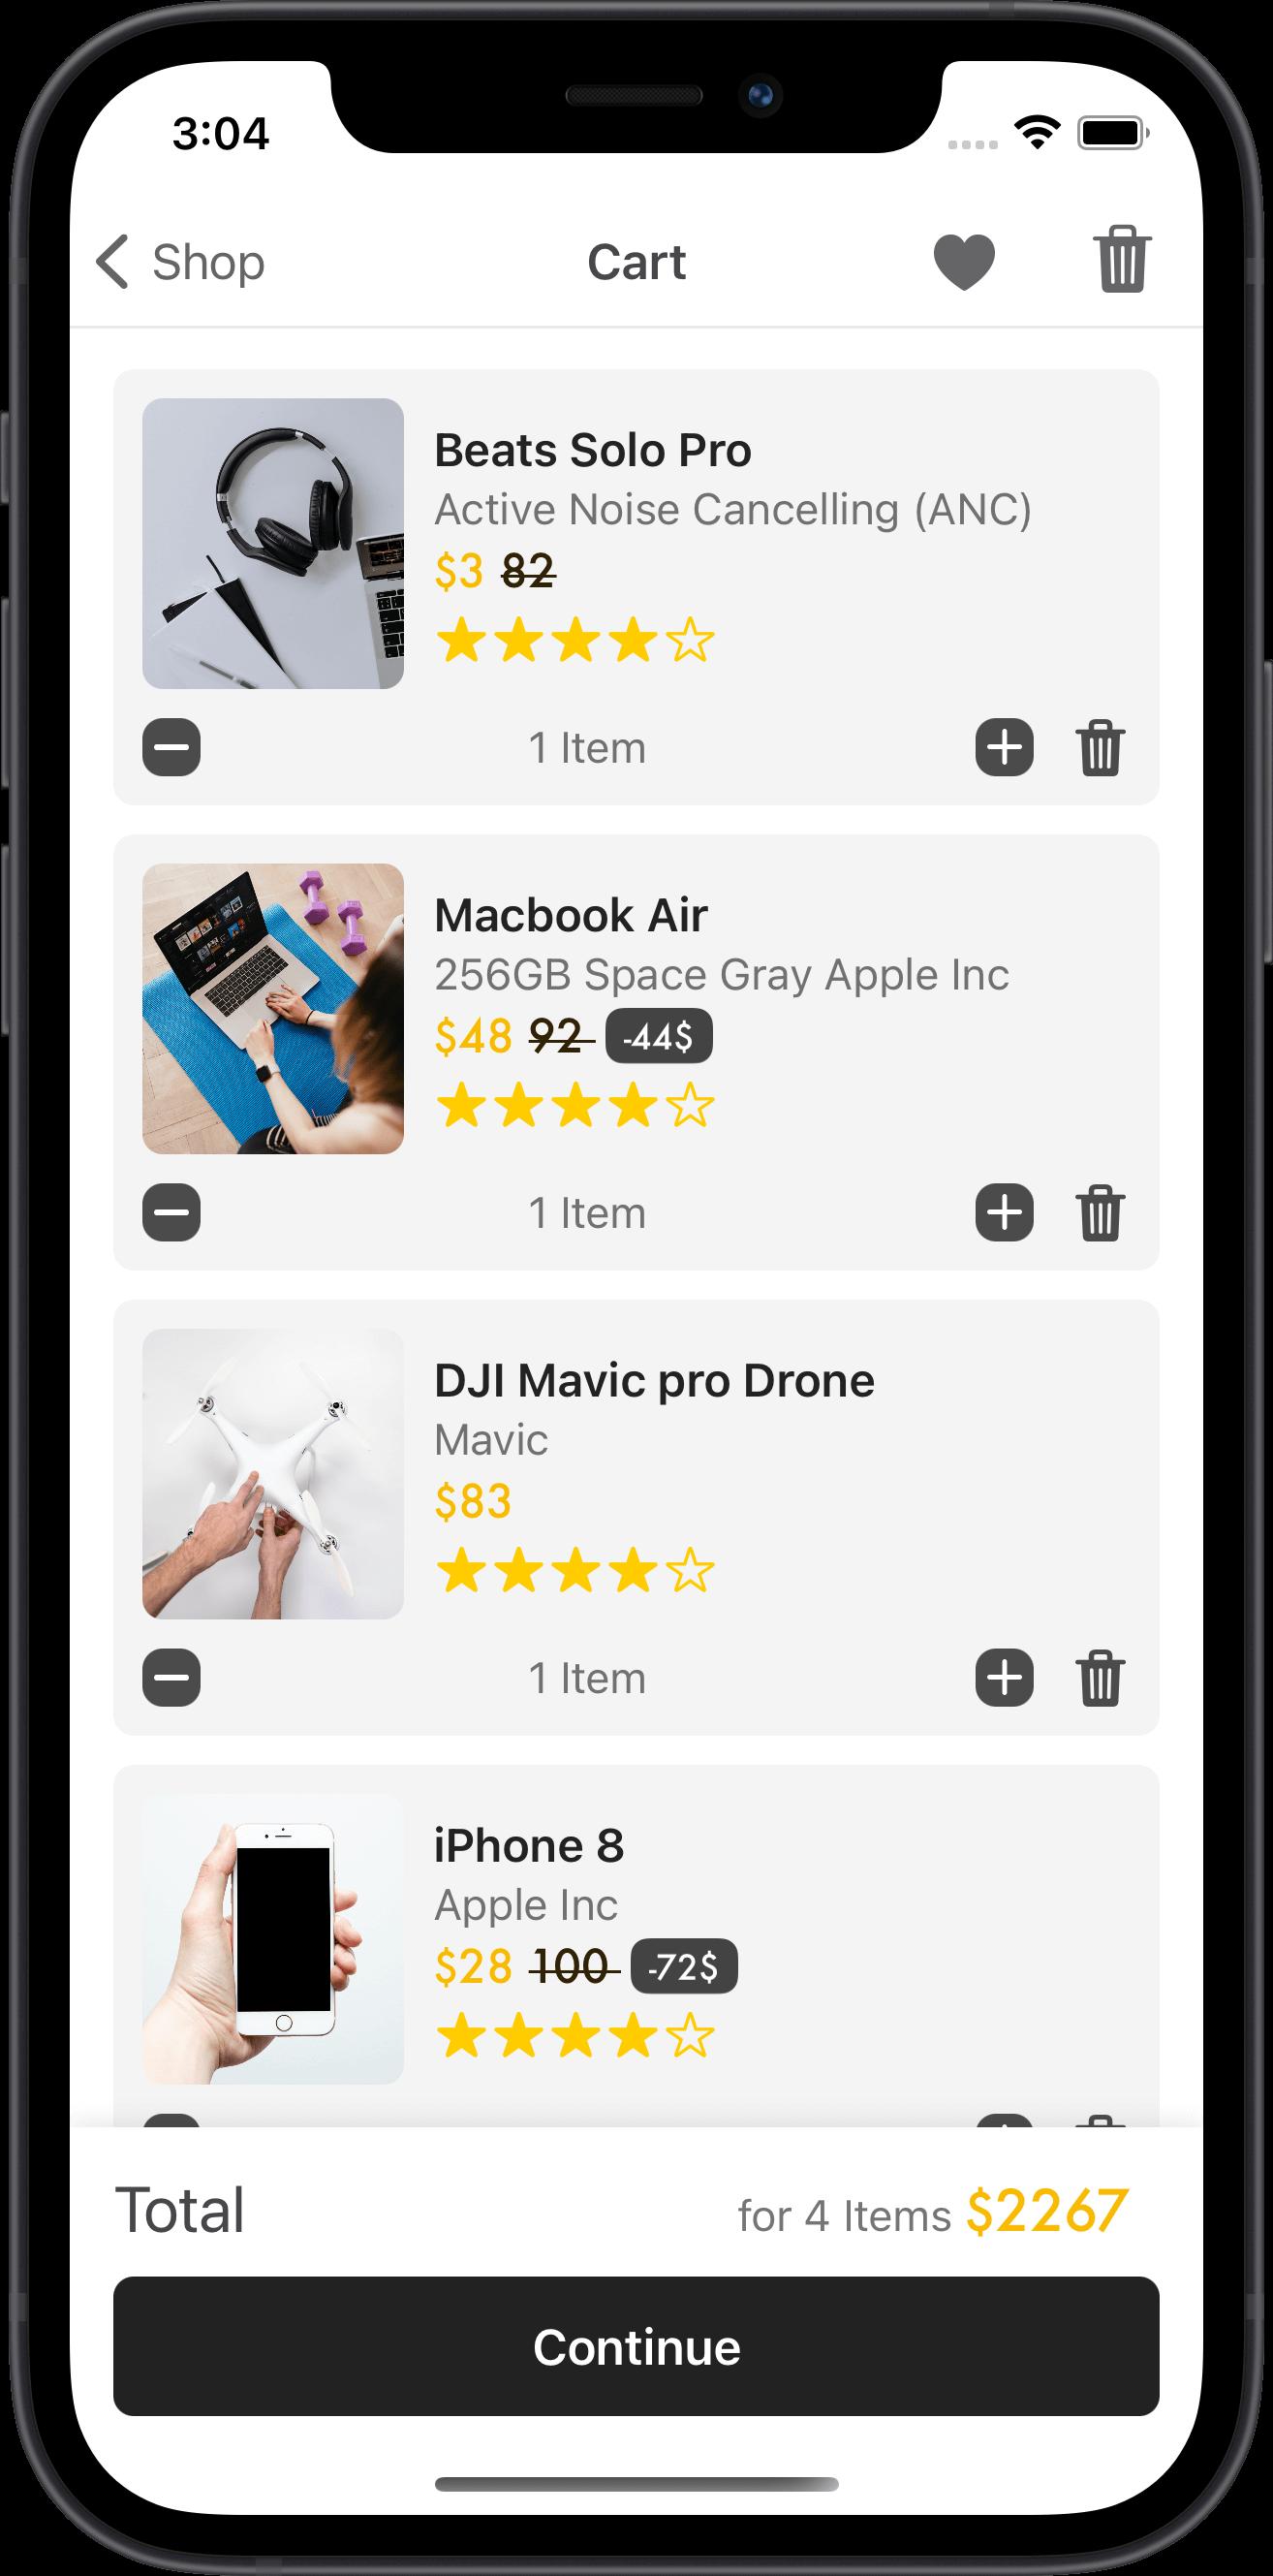 e-commerce, beats, macbook, iphone